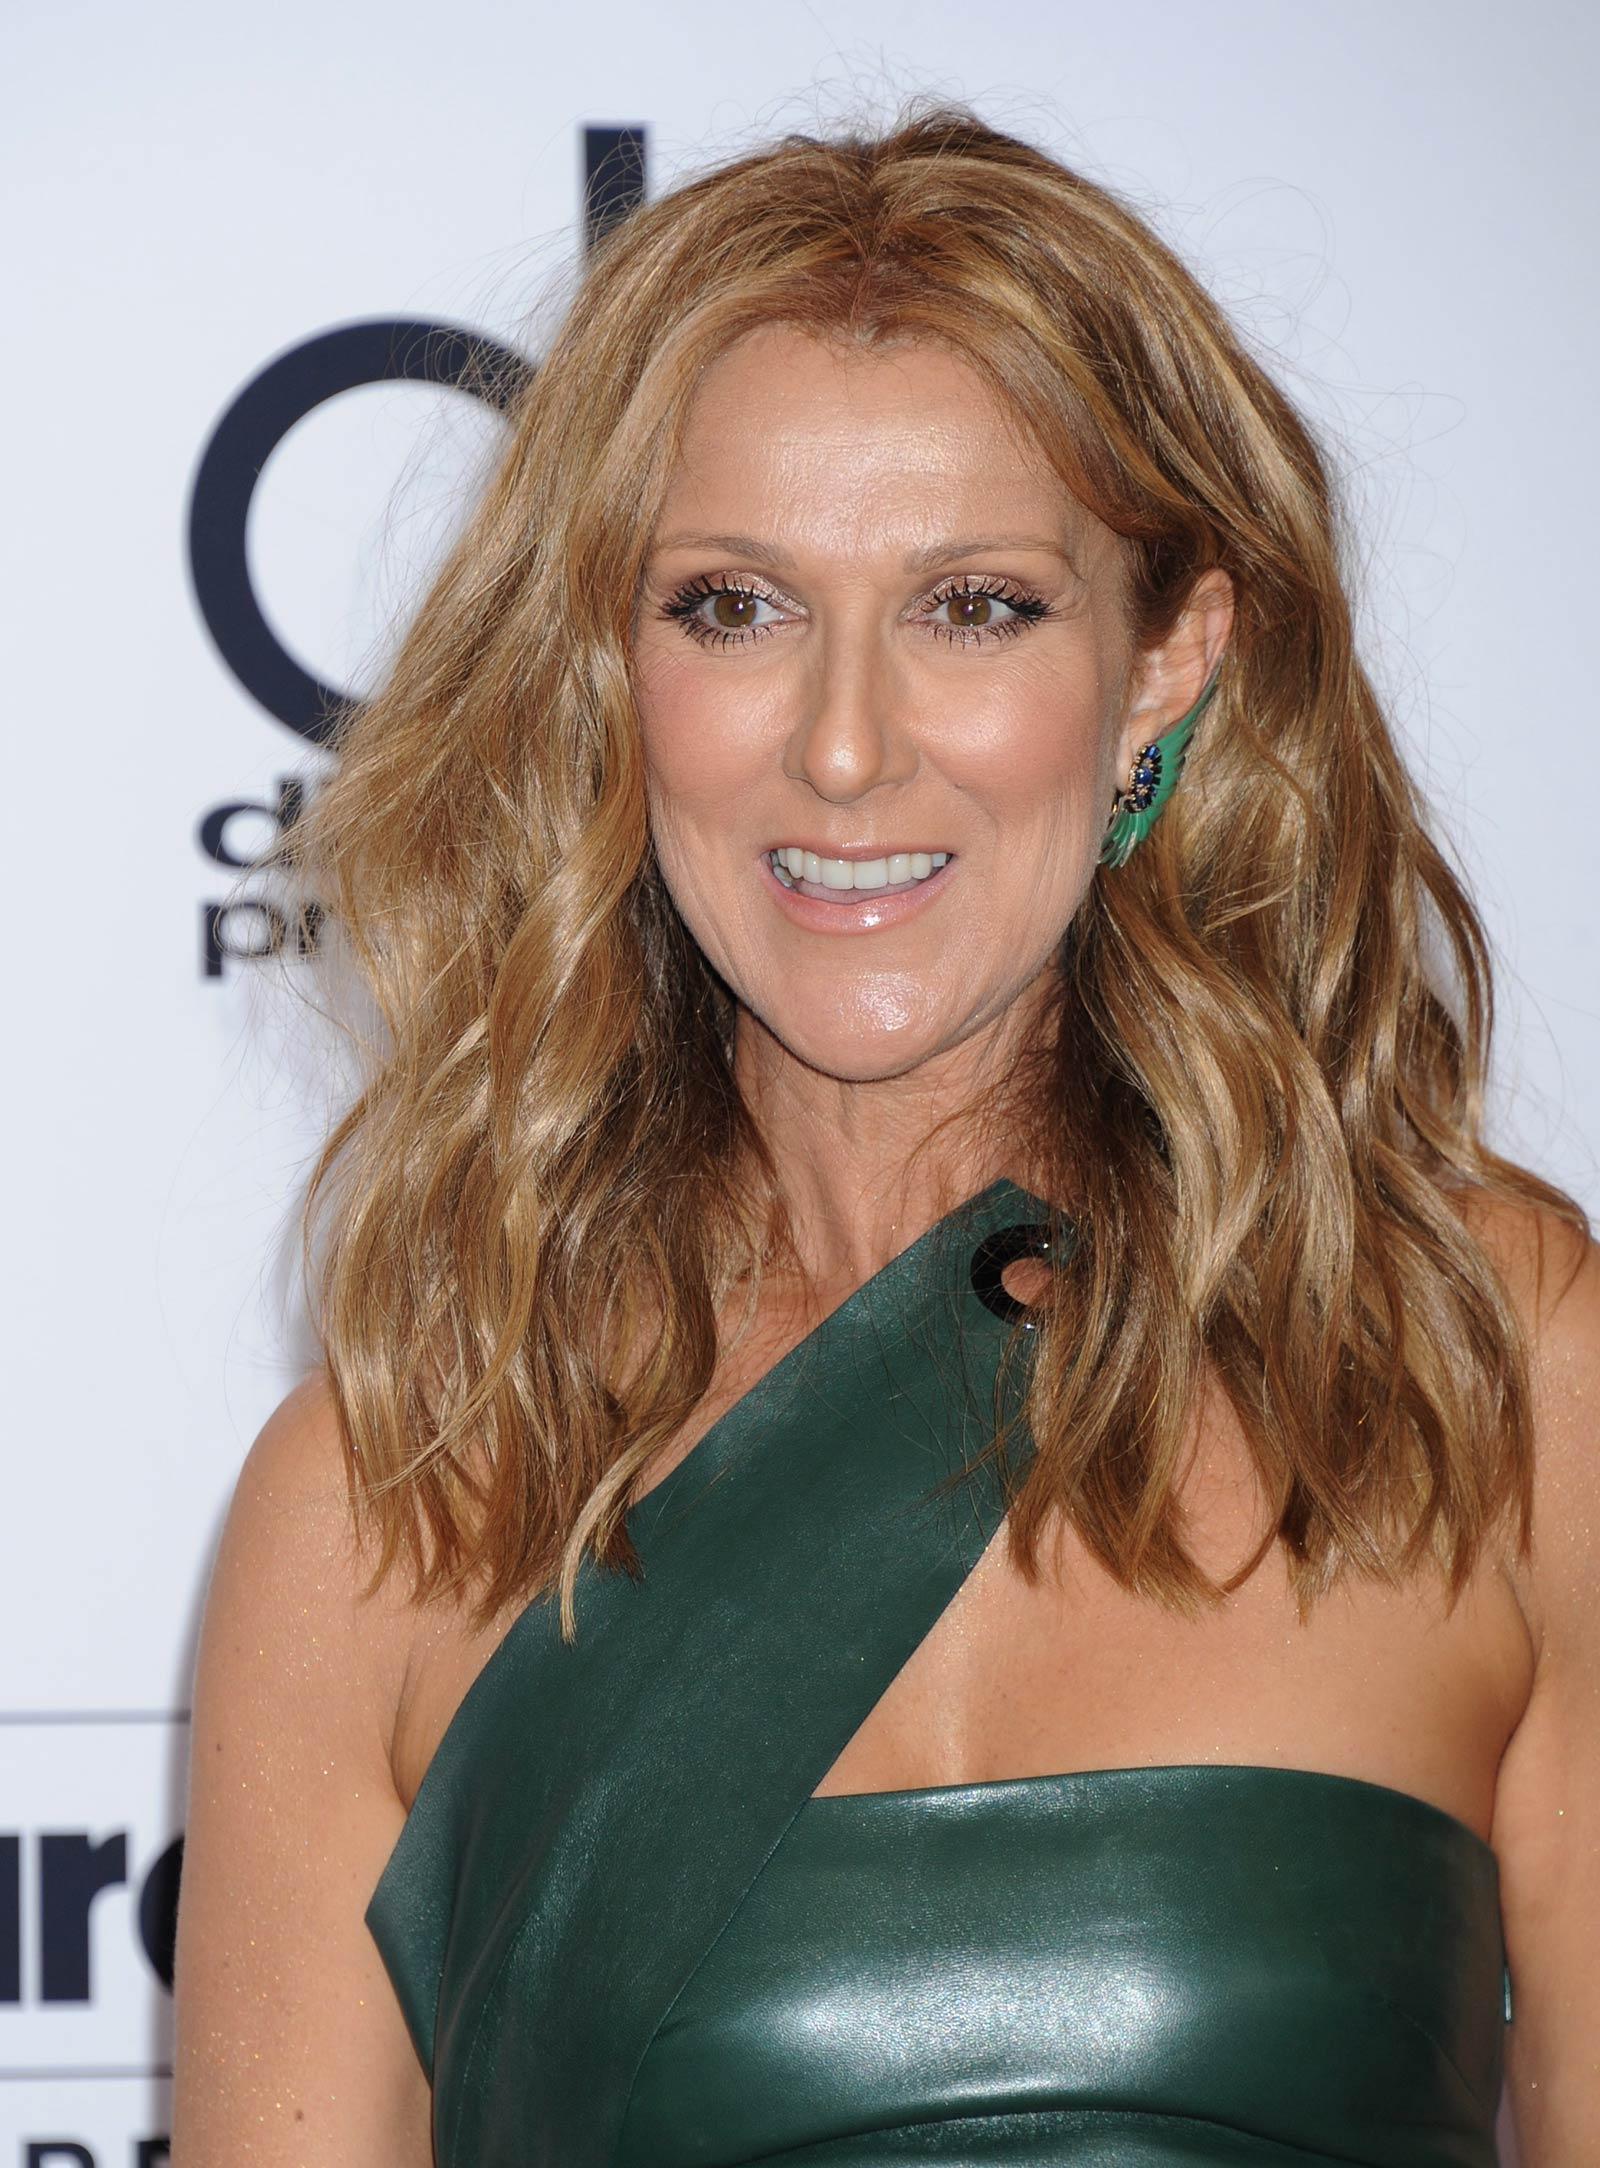 Celine Dion attends the 2015 Billboard Music Awards